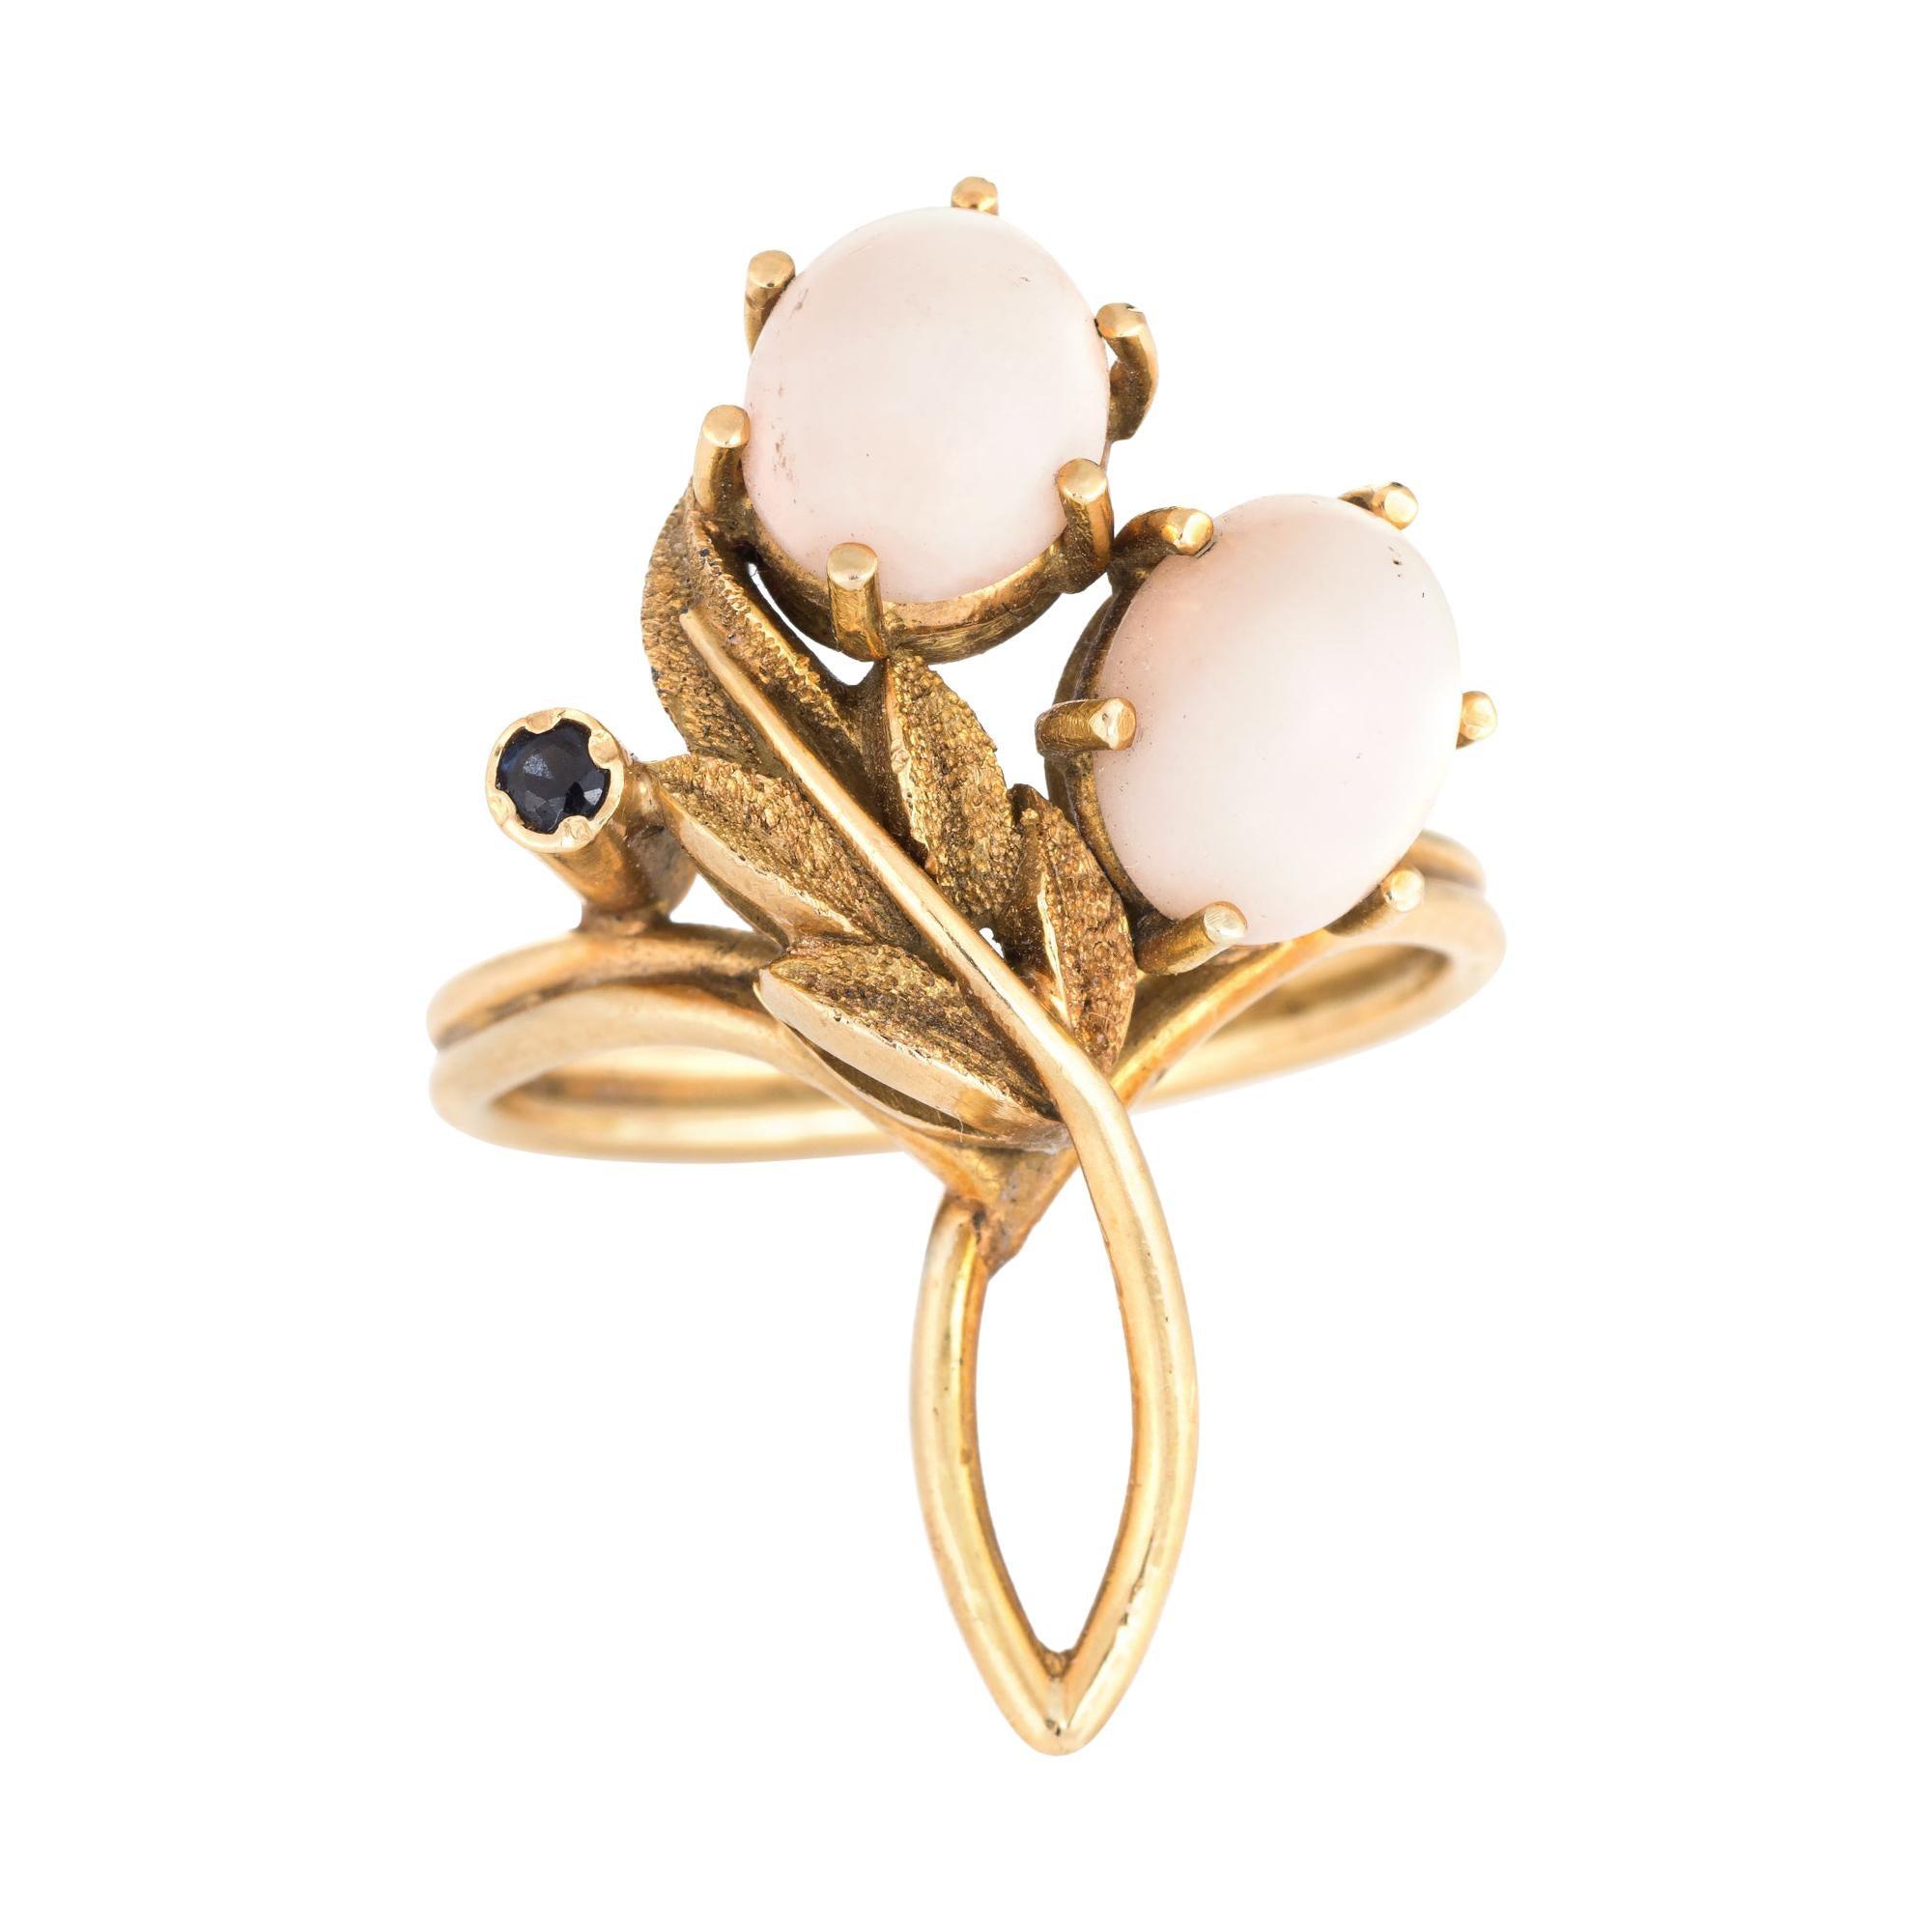 Vintage Angel Skin Coral Ring 14 Karat Gold Sapphire Flower Jewelry Estate